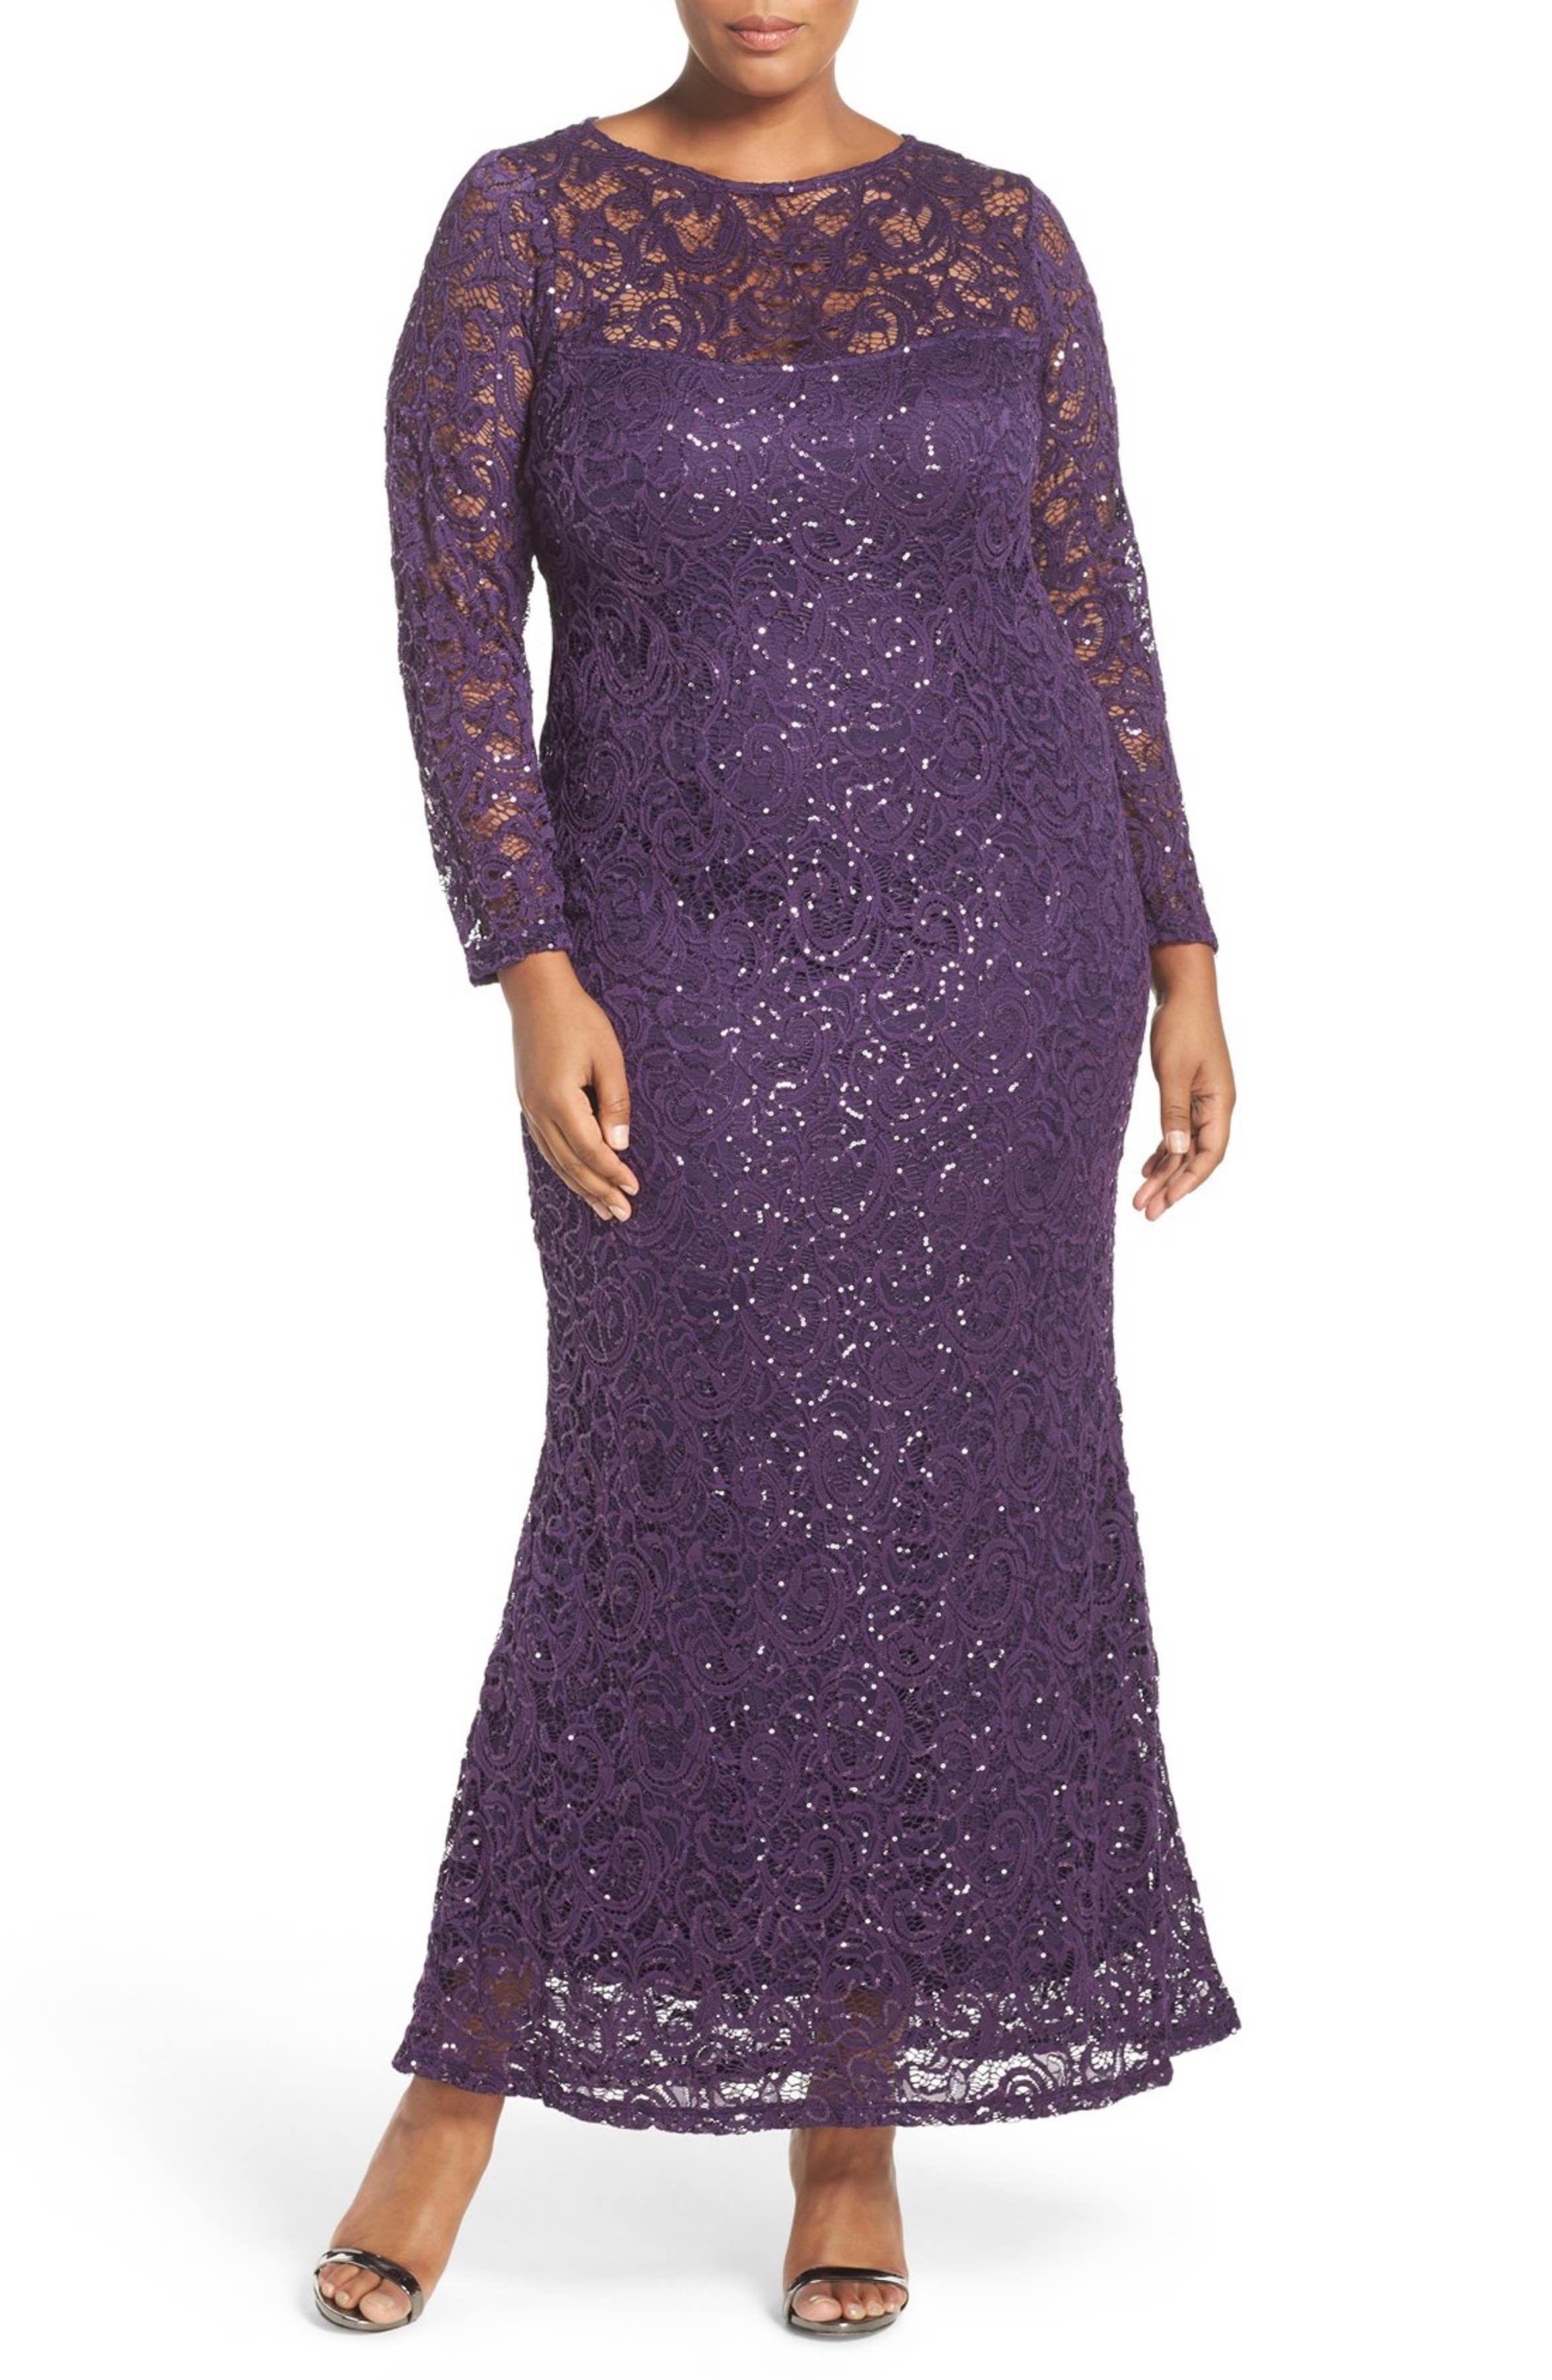 Mother of the bride wedding dresses nordstrom  Main Image  Marina Illusion Yoke u Long Sleeve Lace Gown Plus Size